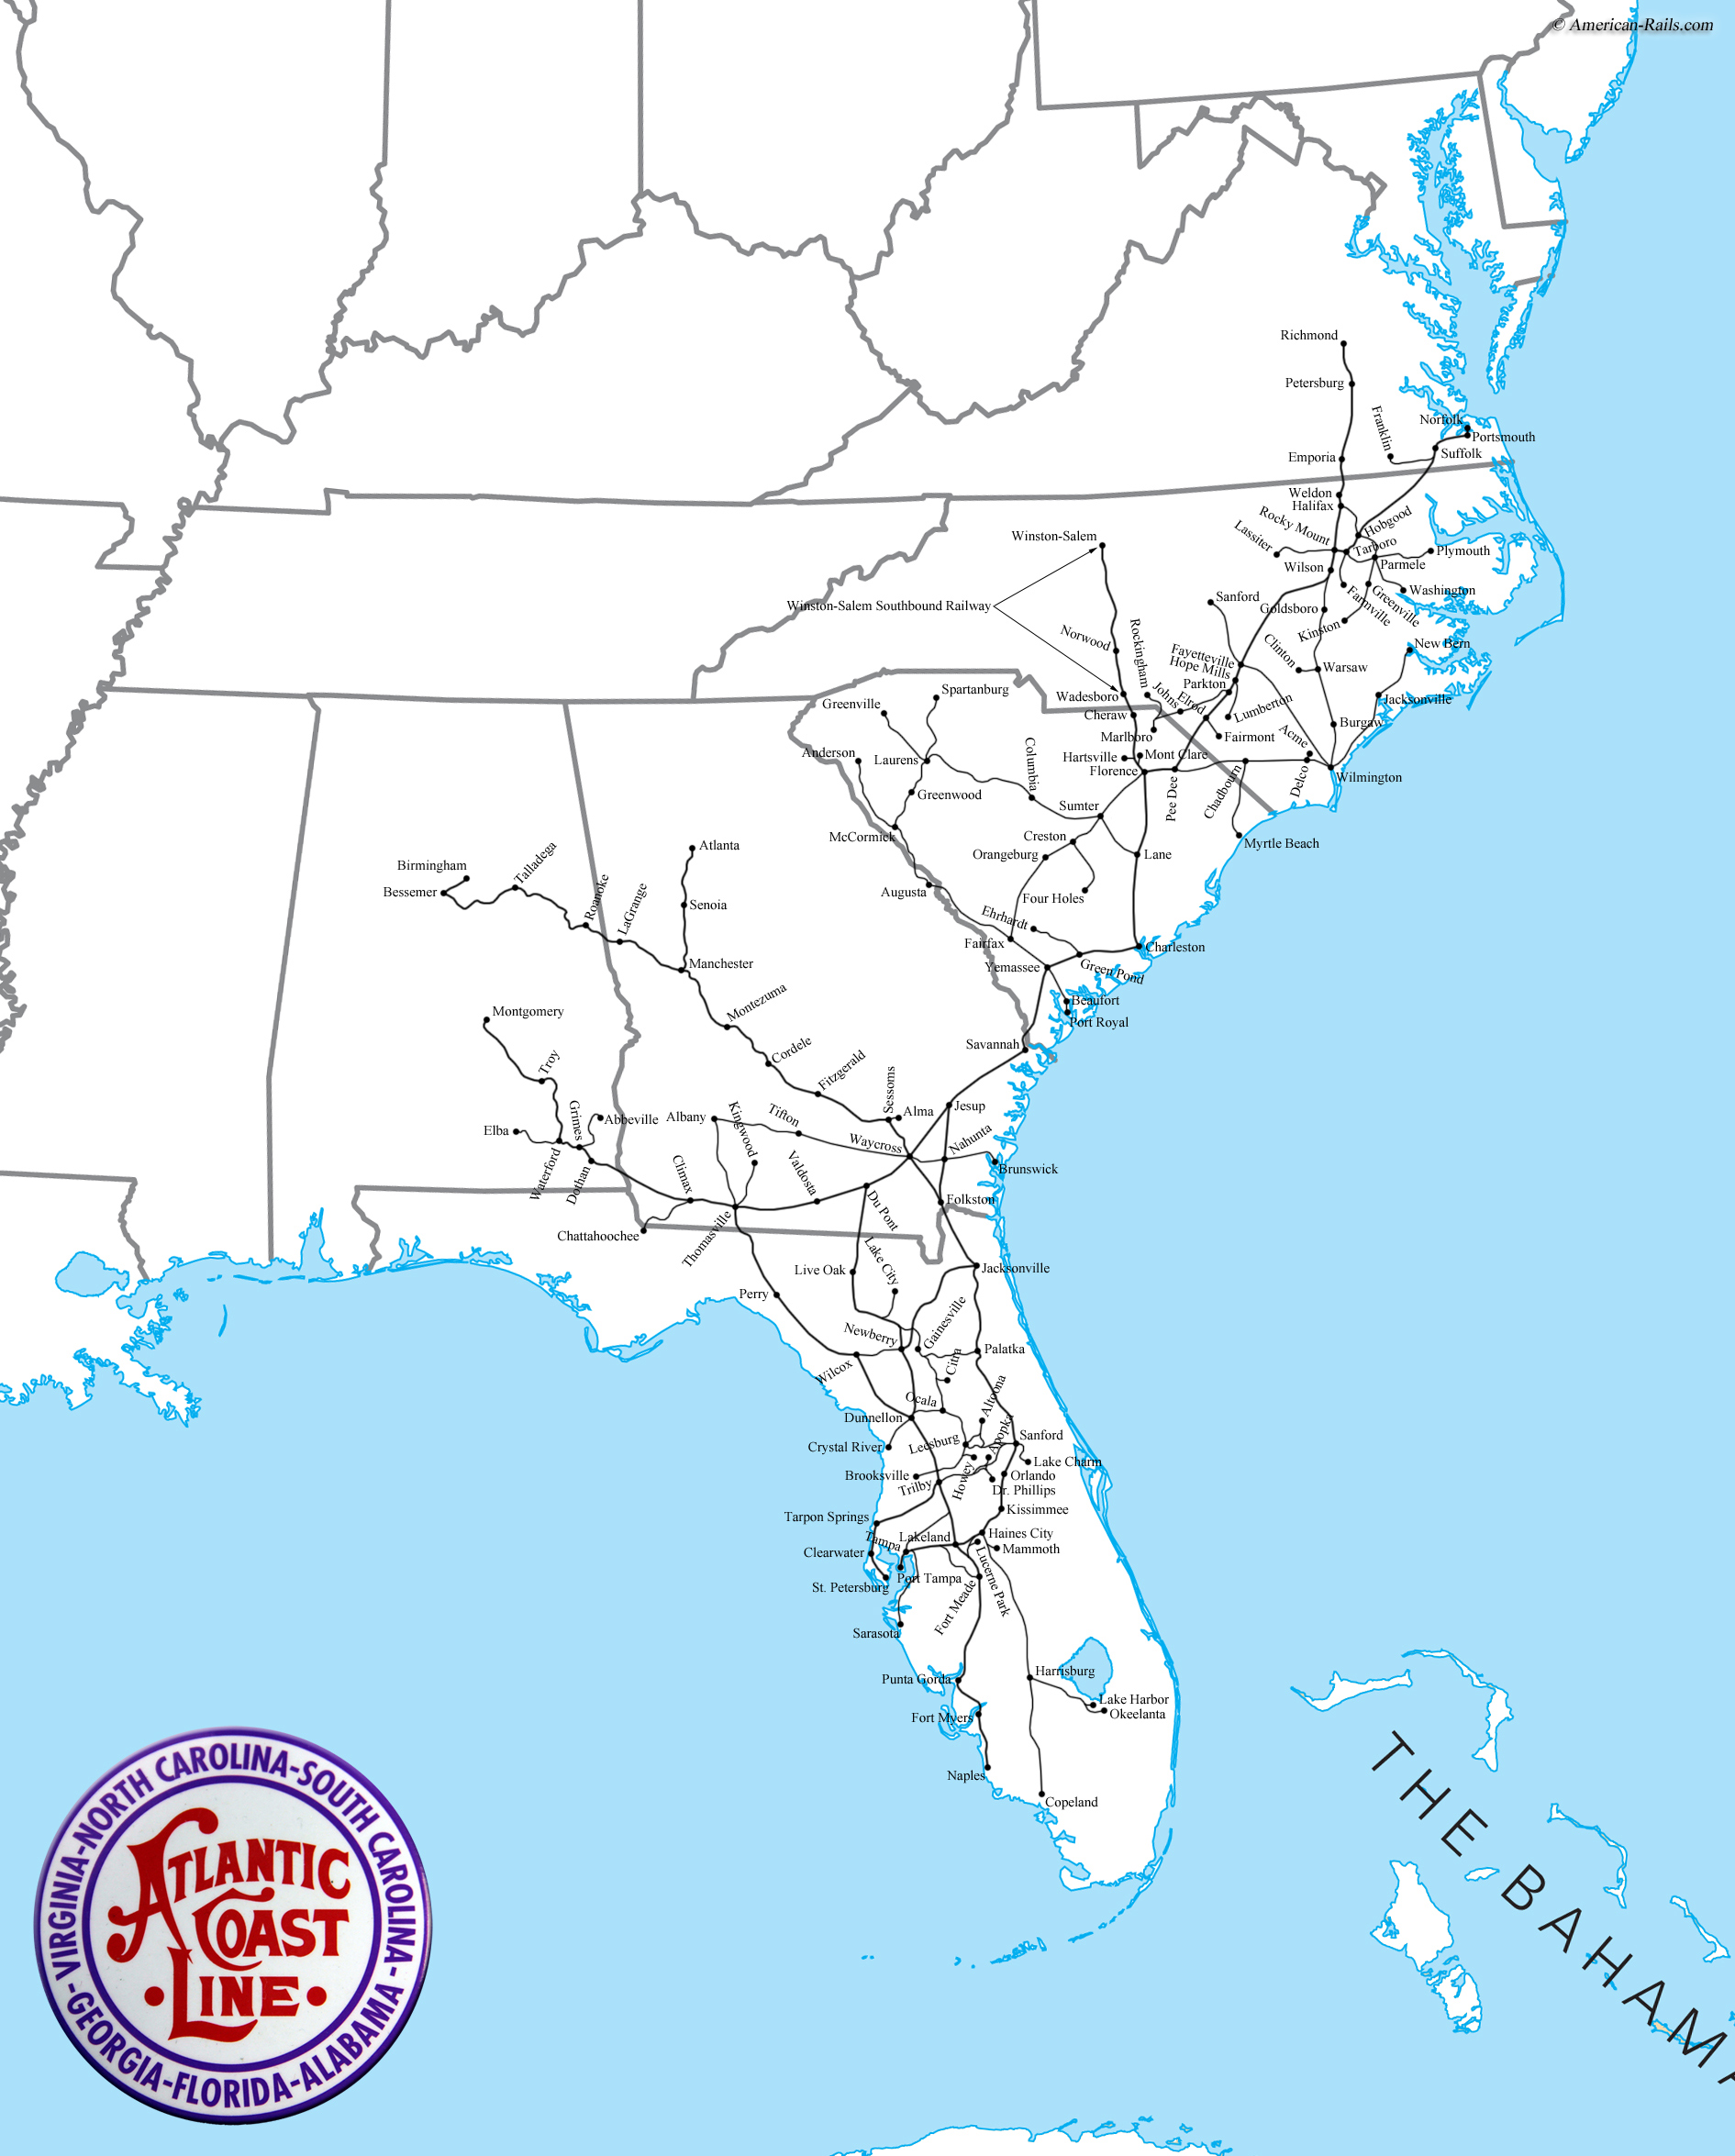 The Atlantic Coast Line Railroad - Us passenger train map